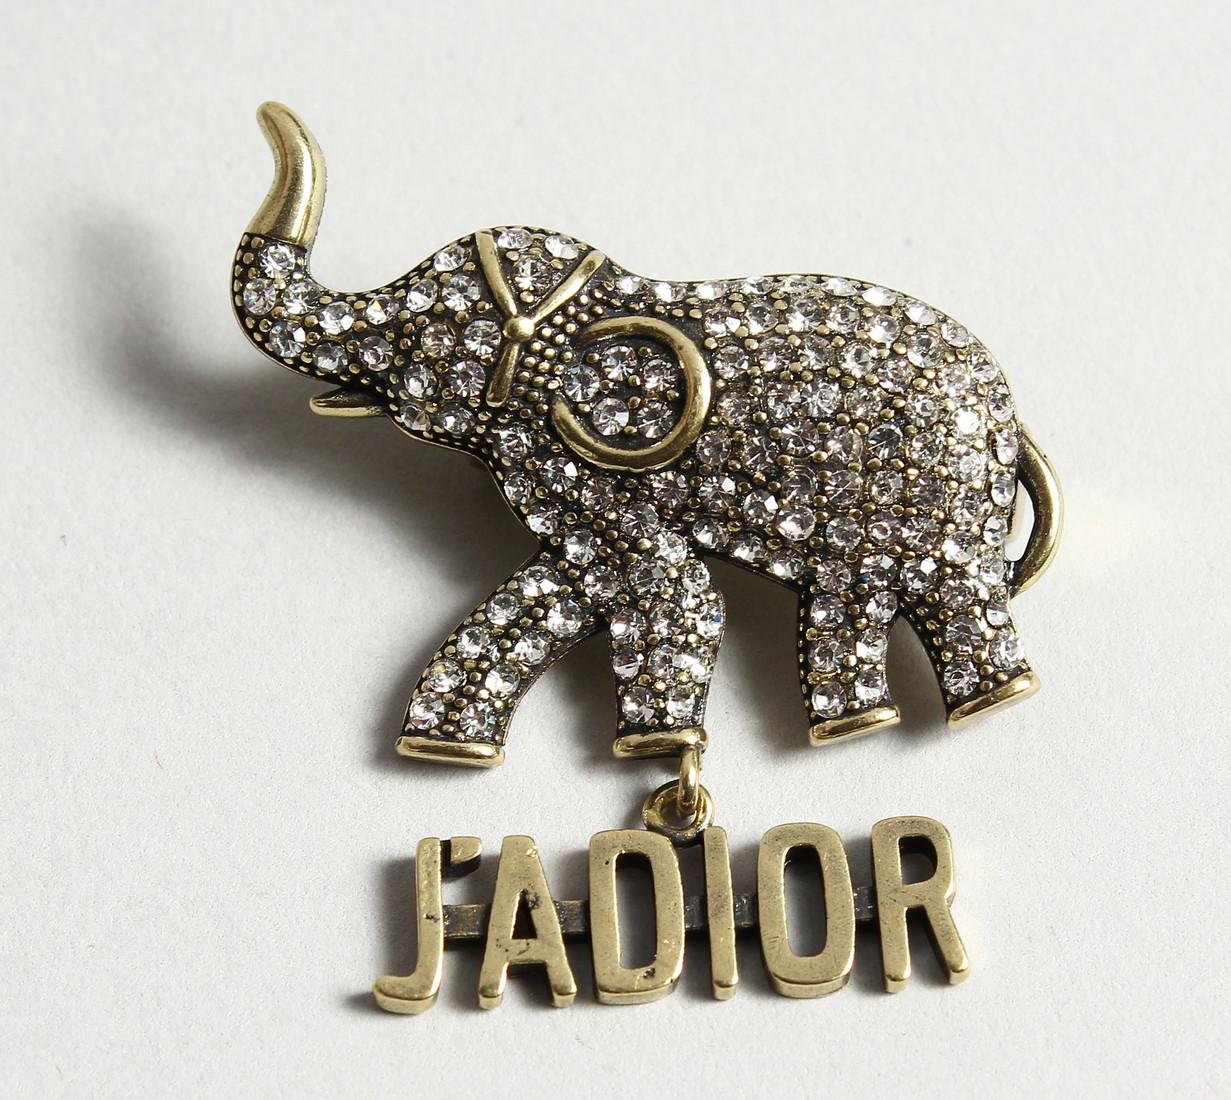 A DIOR JADIOR ELEPHANT BROOCH in a Dior bag and box.